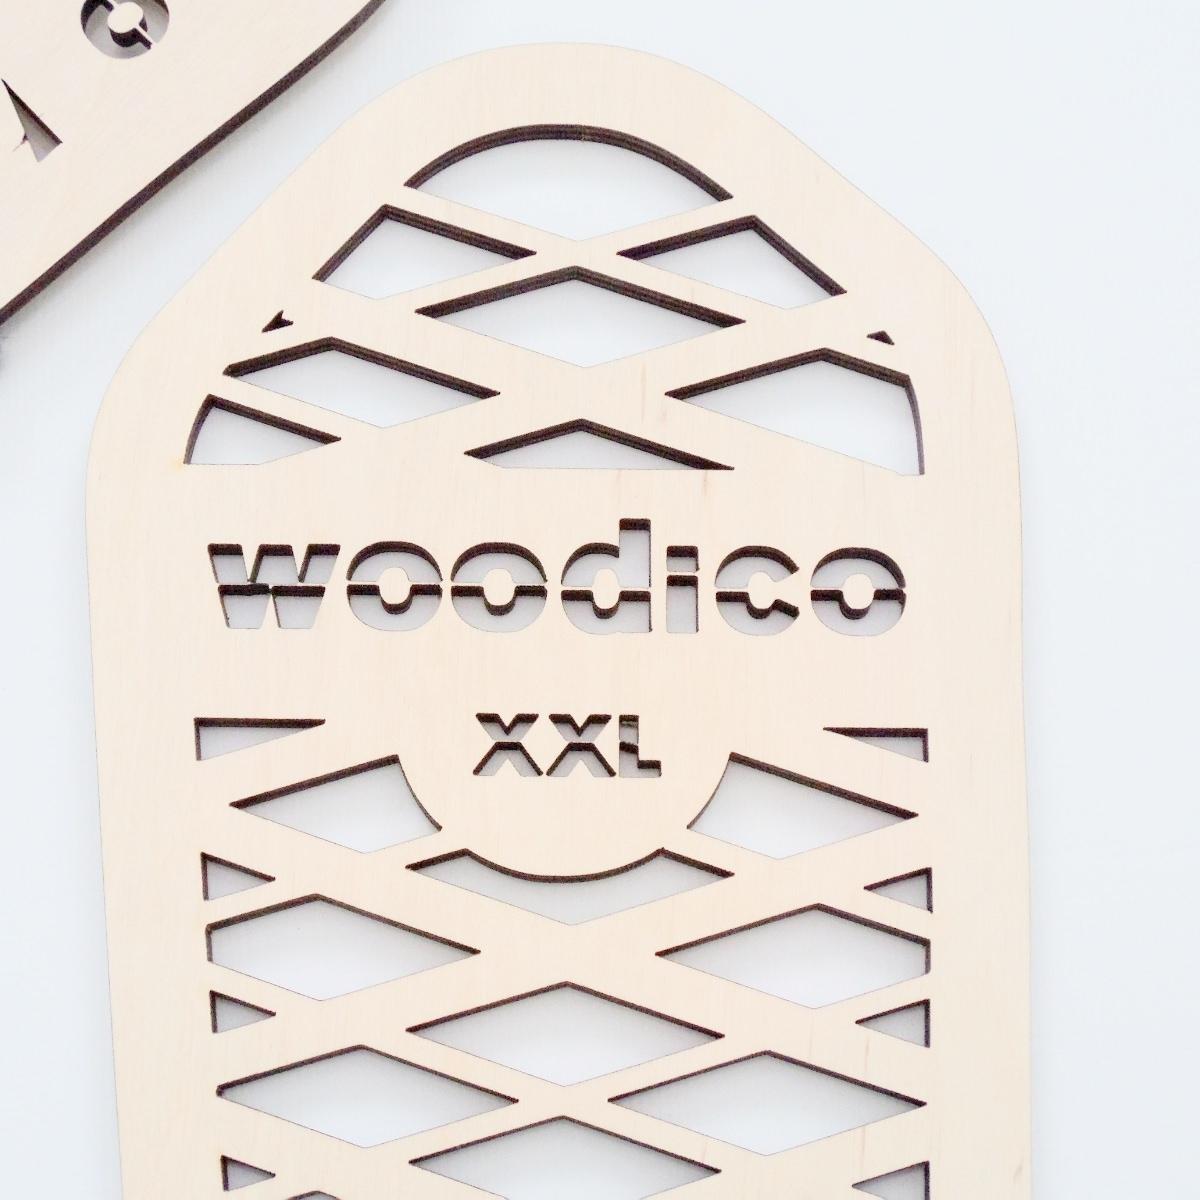 woodico.pro wooden sock blockers sennit 9 1200x1200 - Wooden sock blockers / Sennit